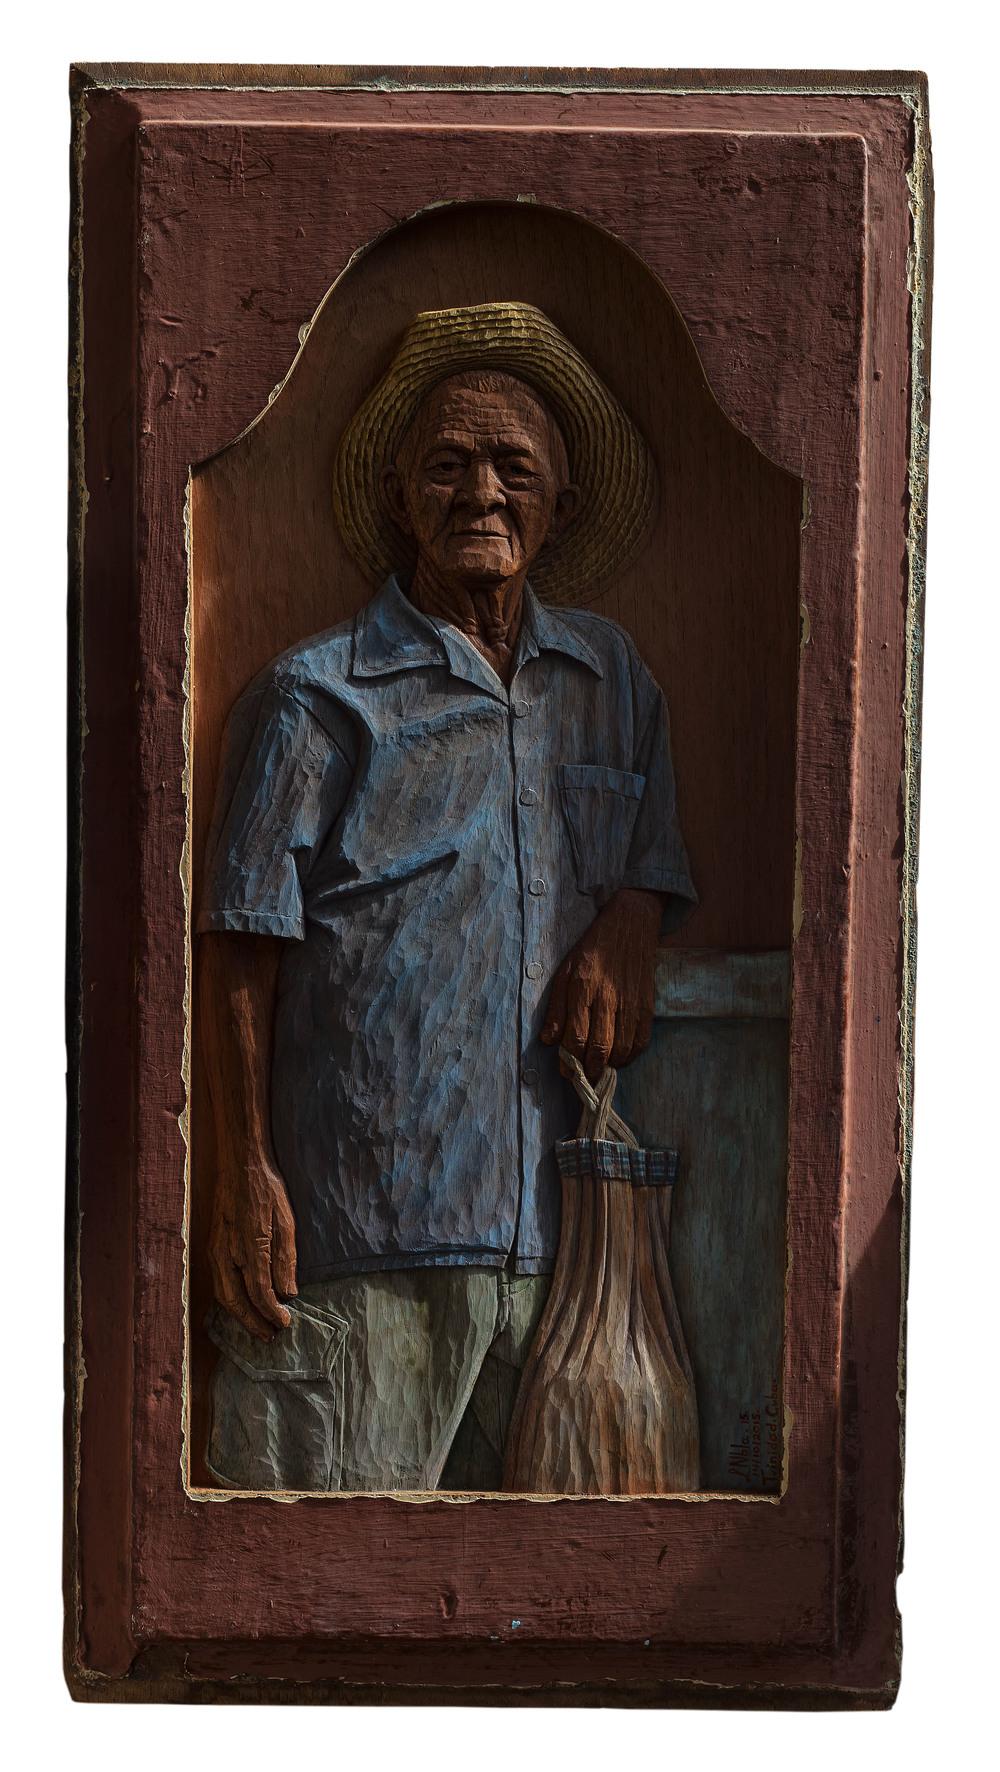 Martiniano Martín Pérez 2 - $6000 78.5 x 40.5 cm 2015